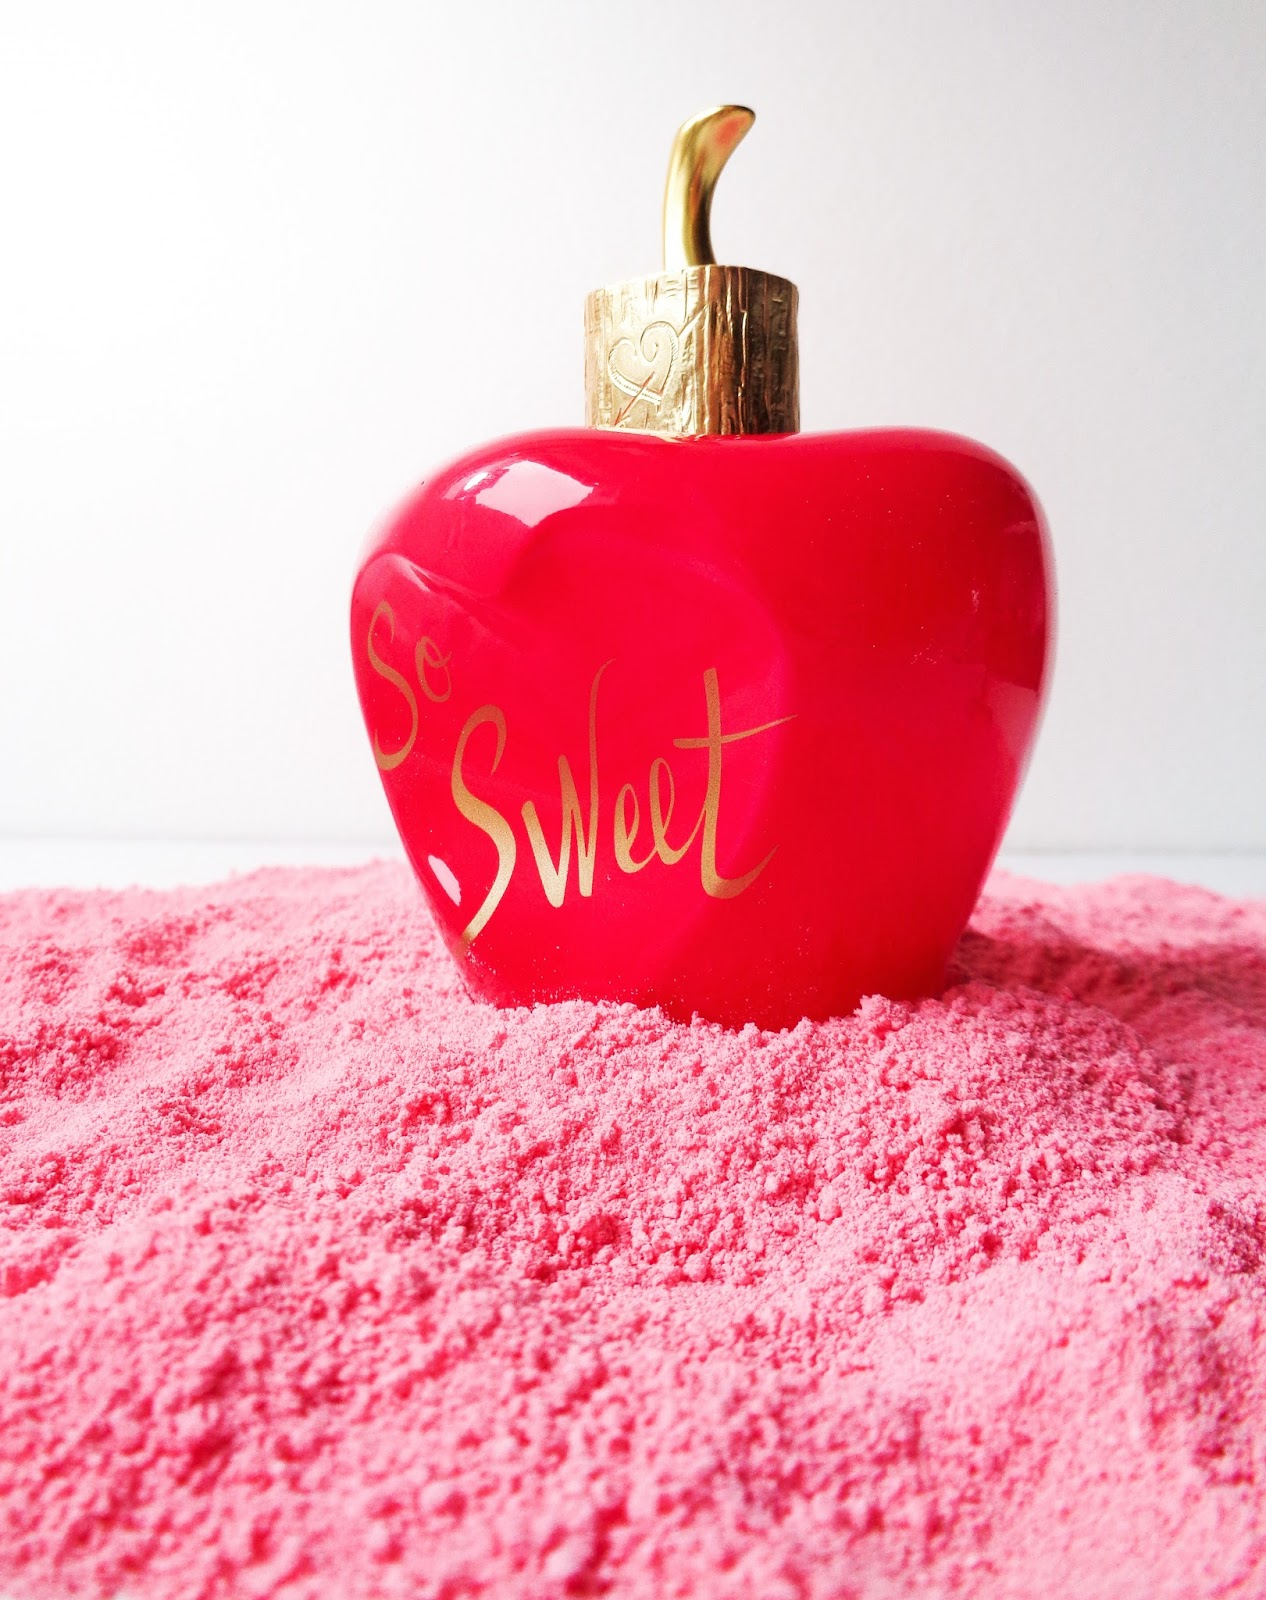 So Blog The Cxedob De Lempicka Lolita Sweet Mariette lJcFK3T1